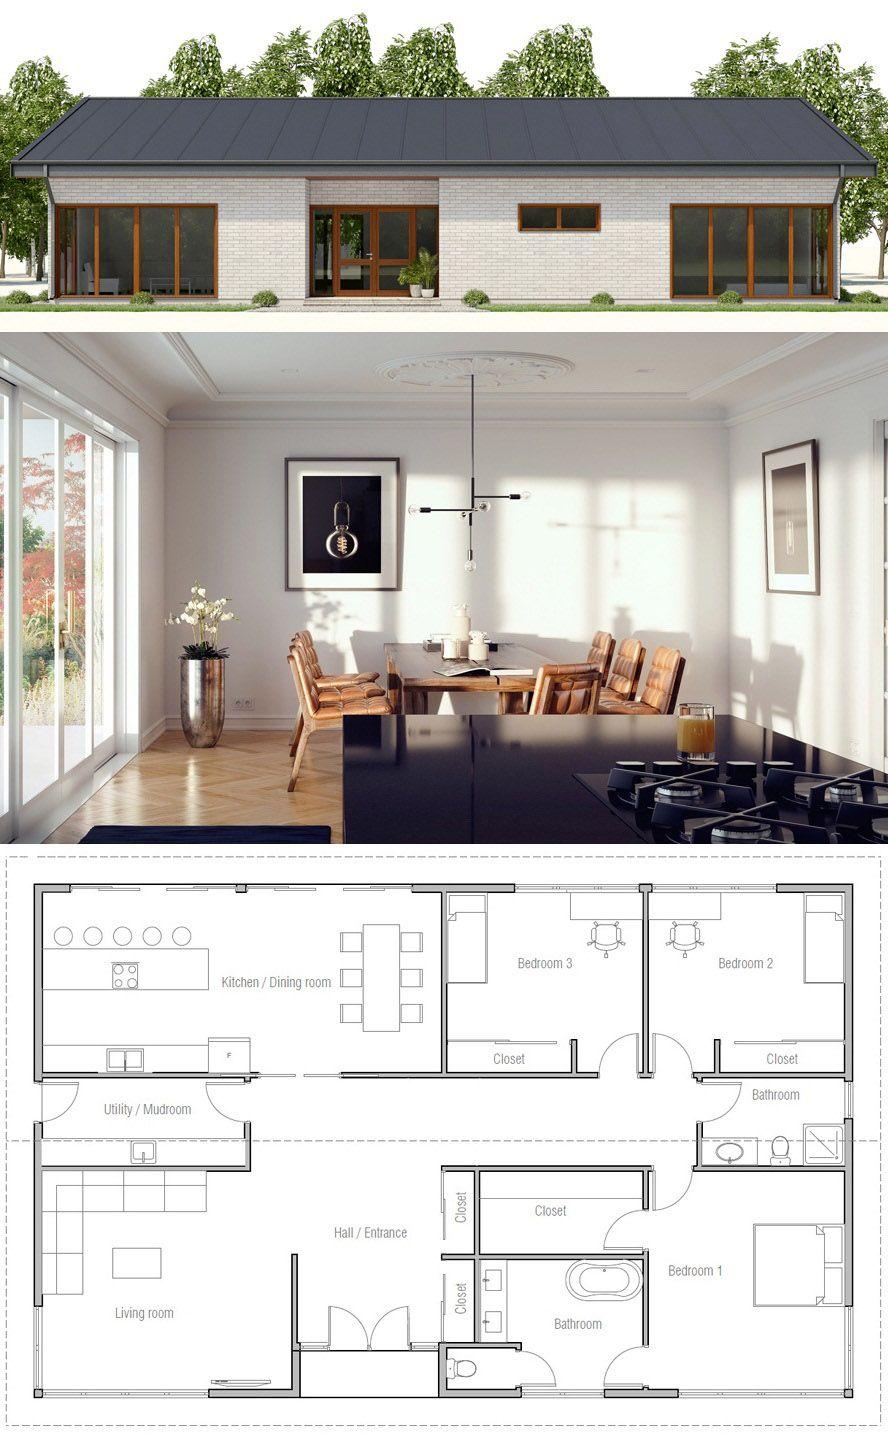 Architecture Home Plan Floor Plans Homedecor Smallhouse Small House Plans House Construction Plan House Floor Plans